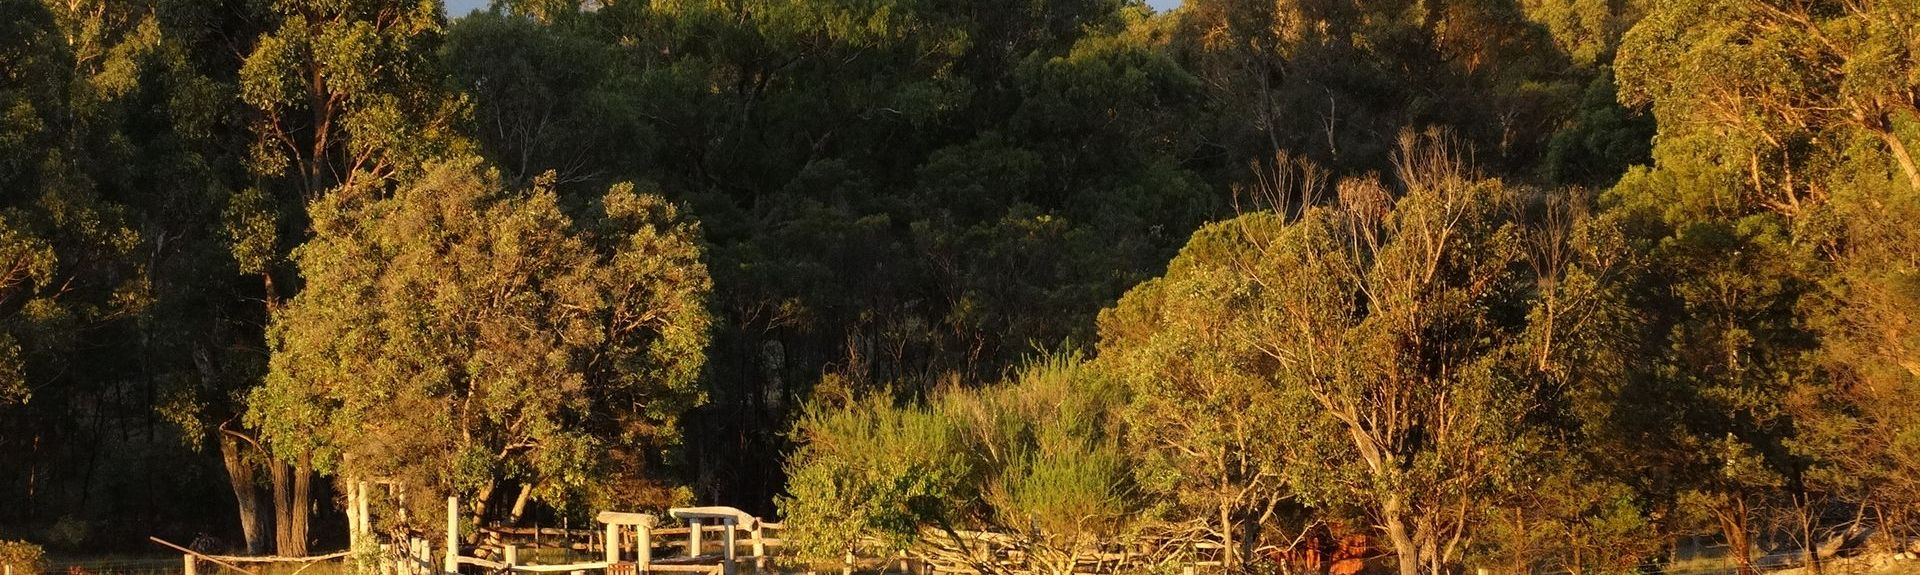 Wyberba, Queensland, Australien